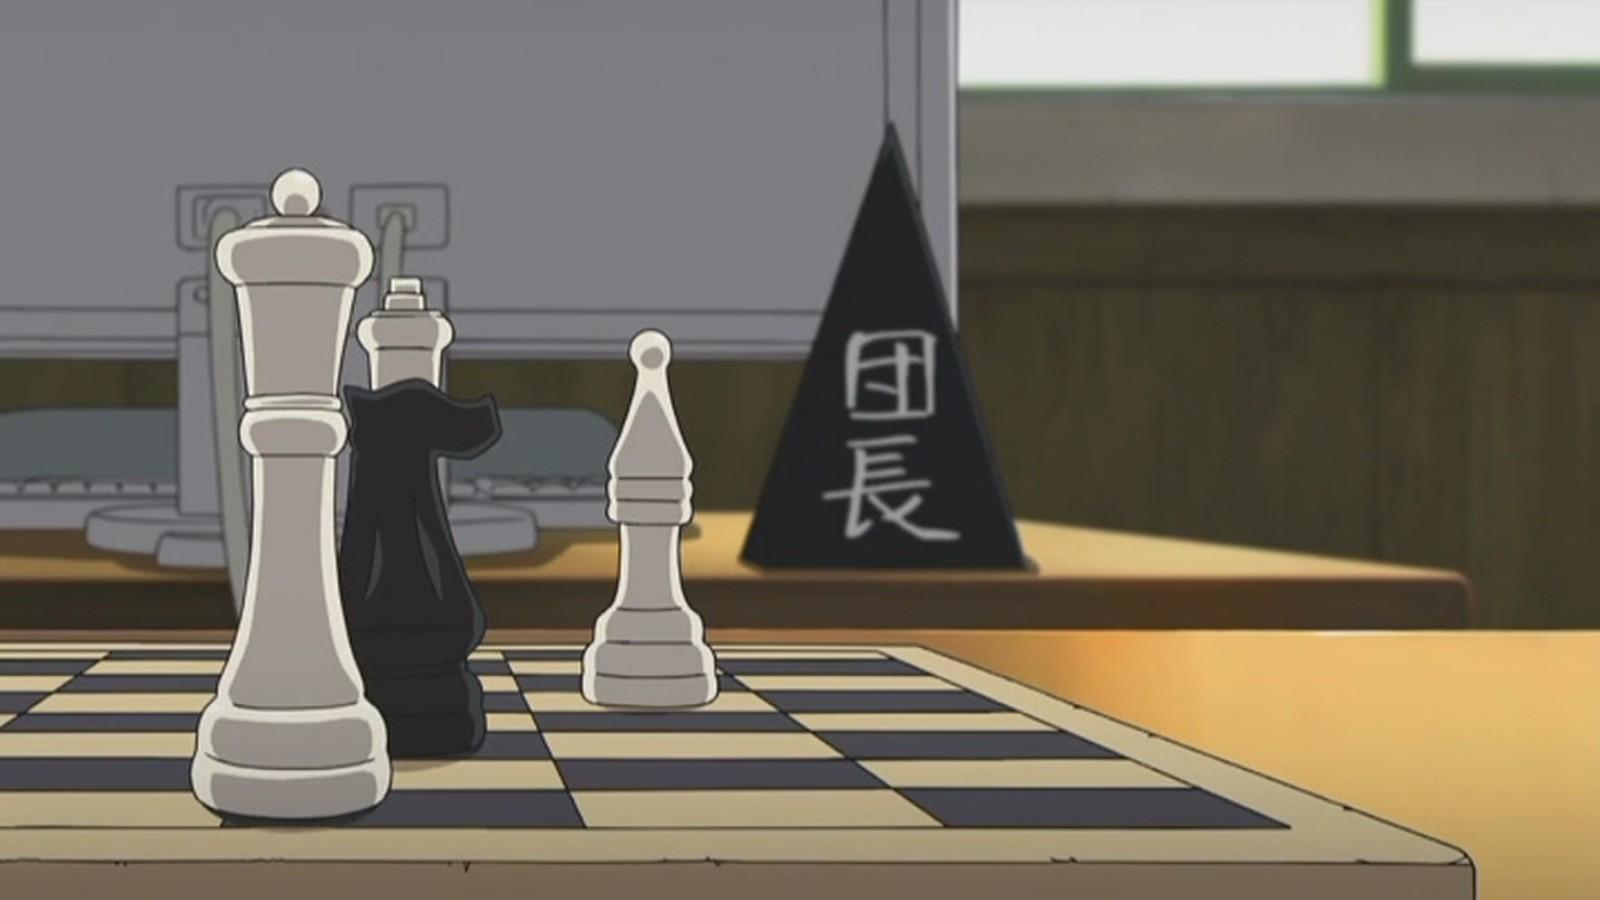 Huawei Chess Wallpaper: Chess Wallpapers 24